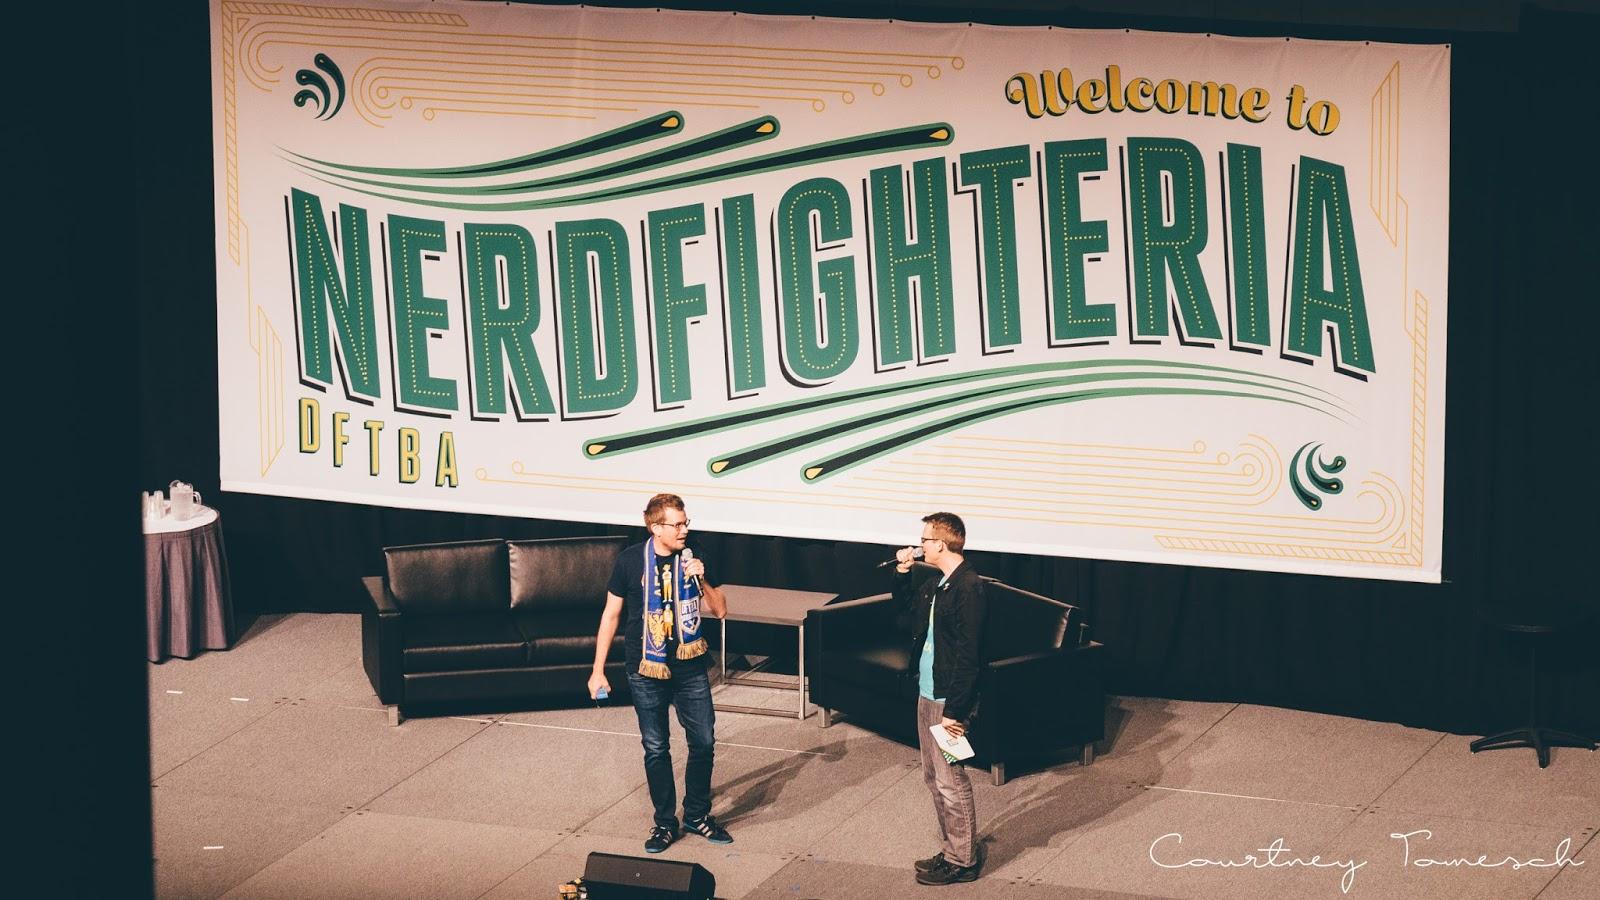 Courtney Tomesch NerdCon Nerdfighteria Boston